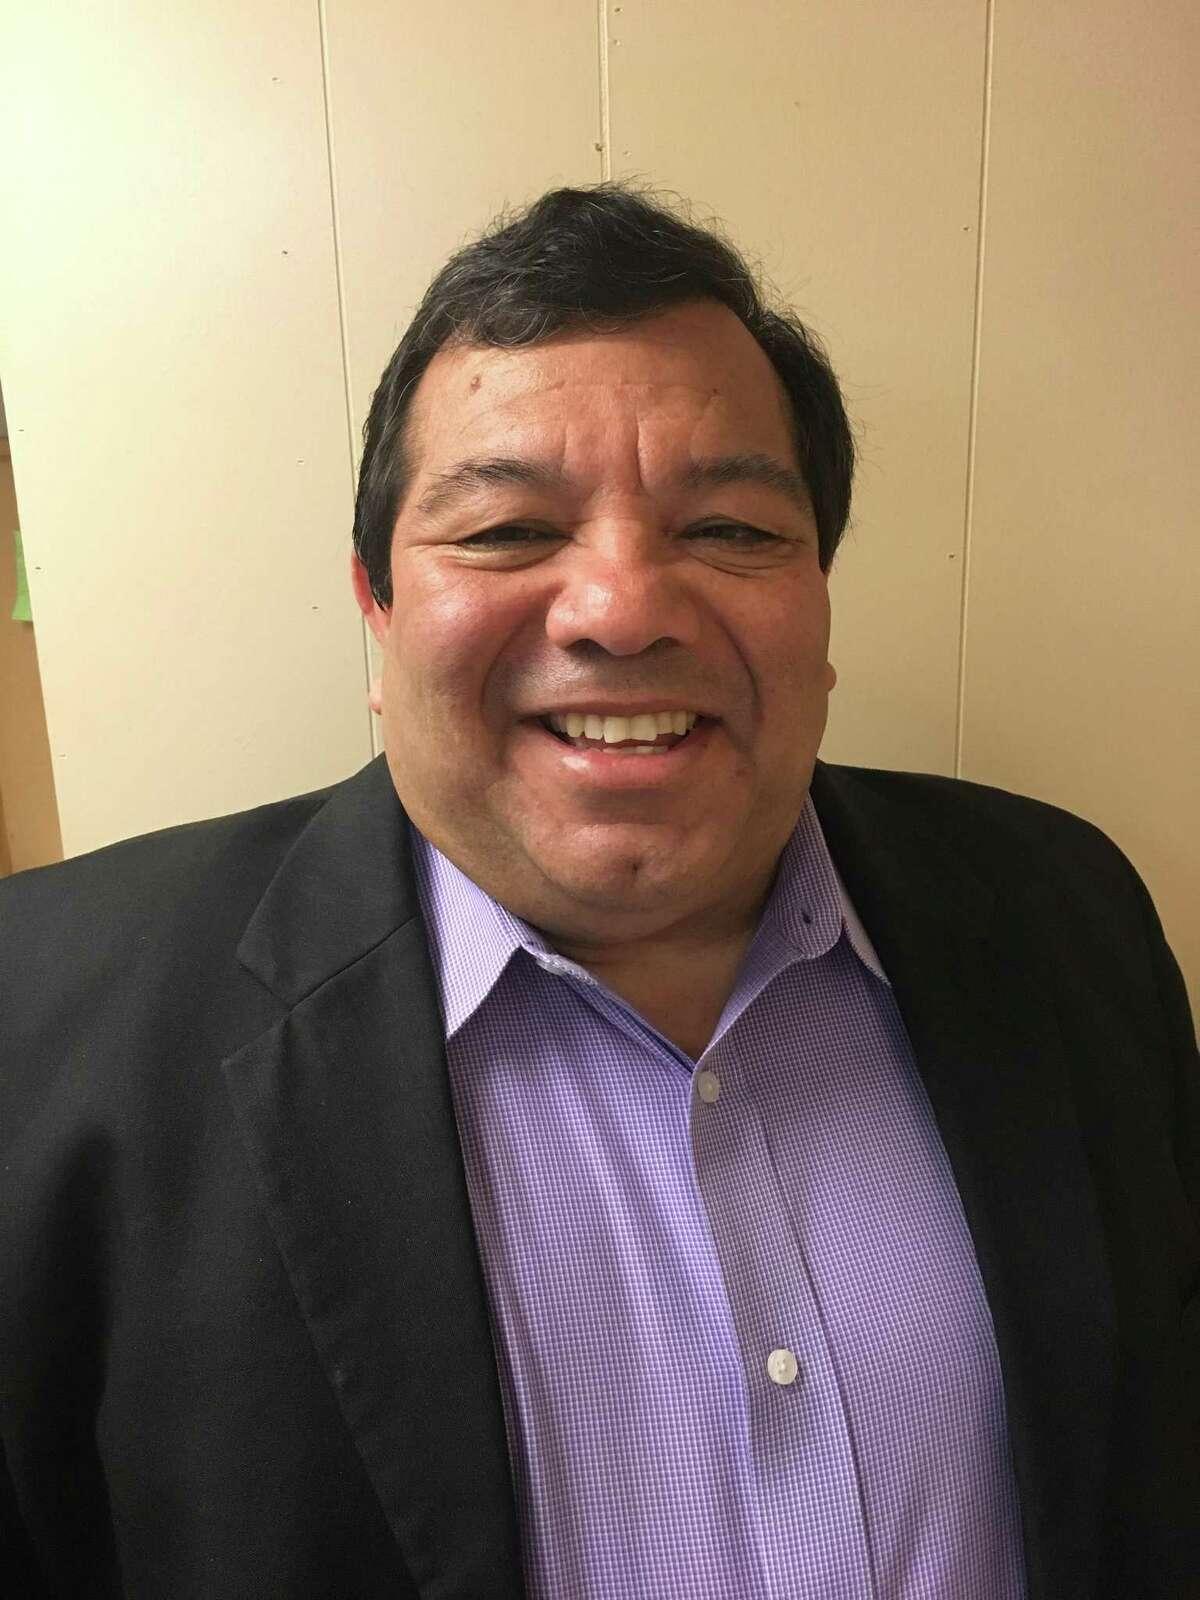 Orlando Salazar is running for Harlandale school board.